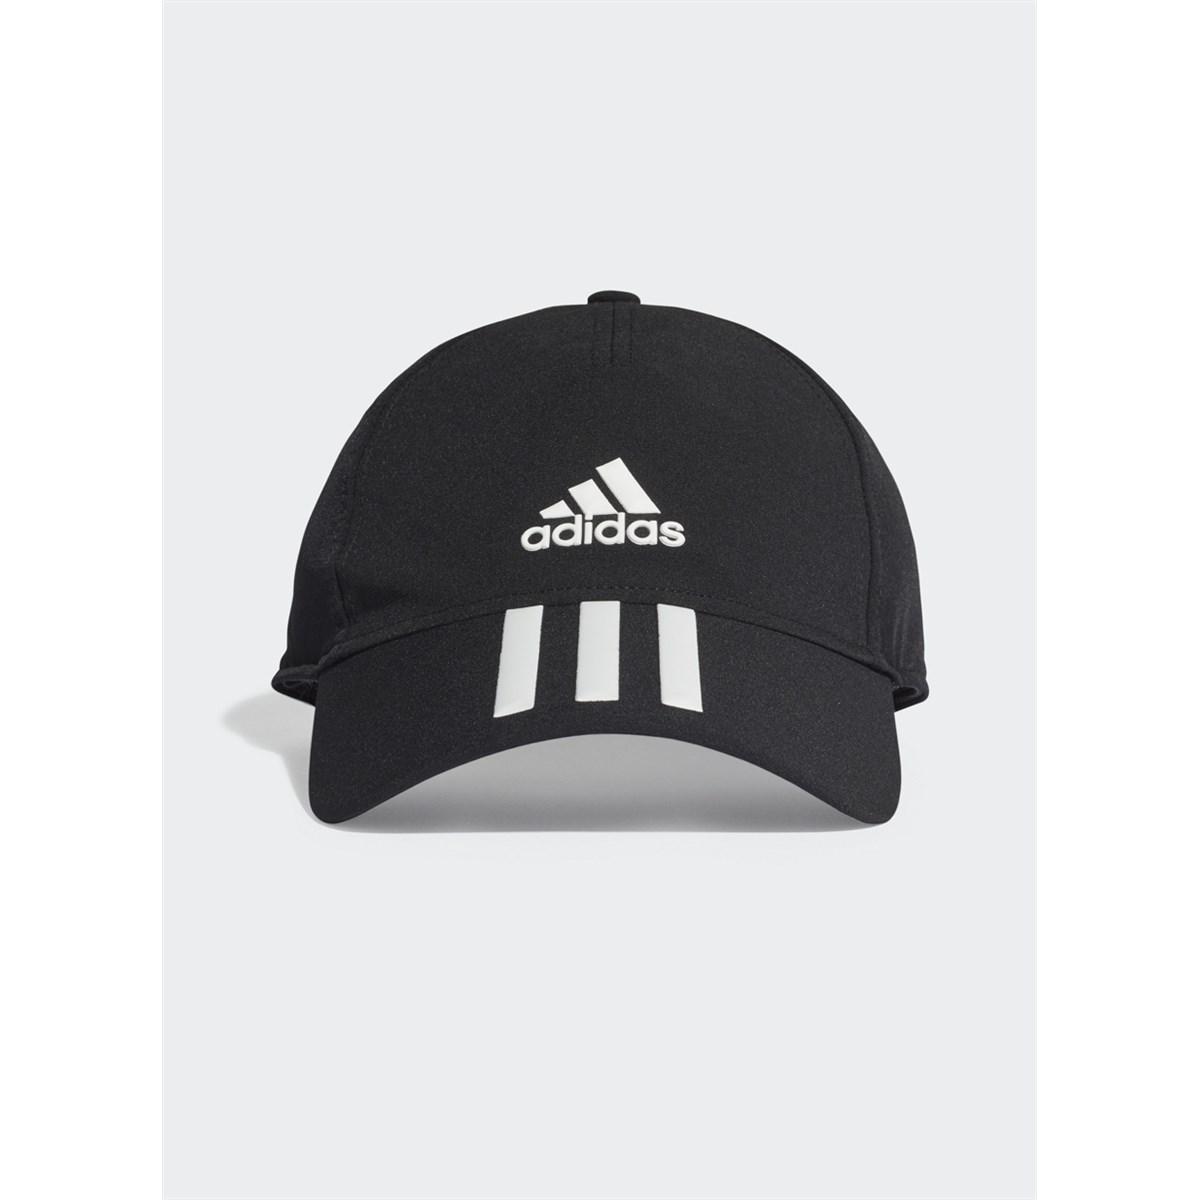 Aeroready 4athlts Siyah Beyzbol Şapkası